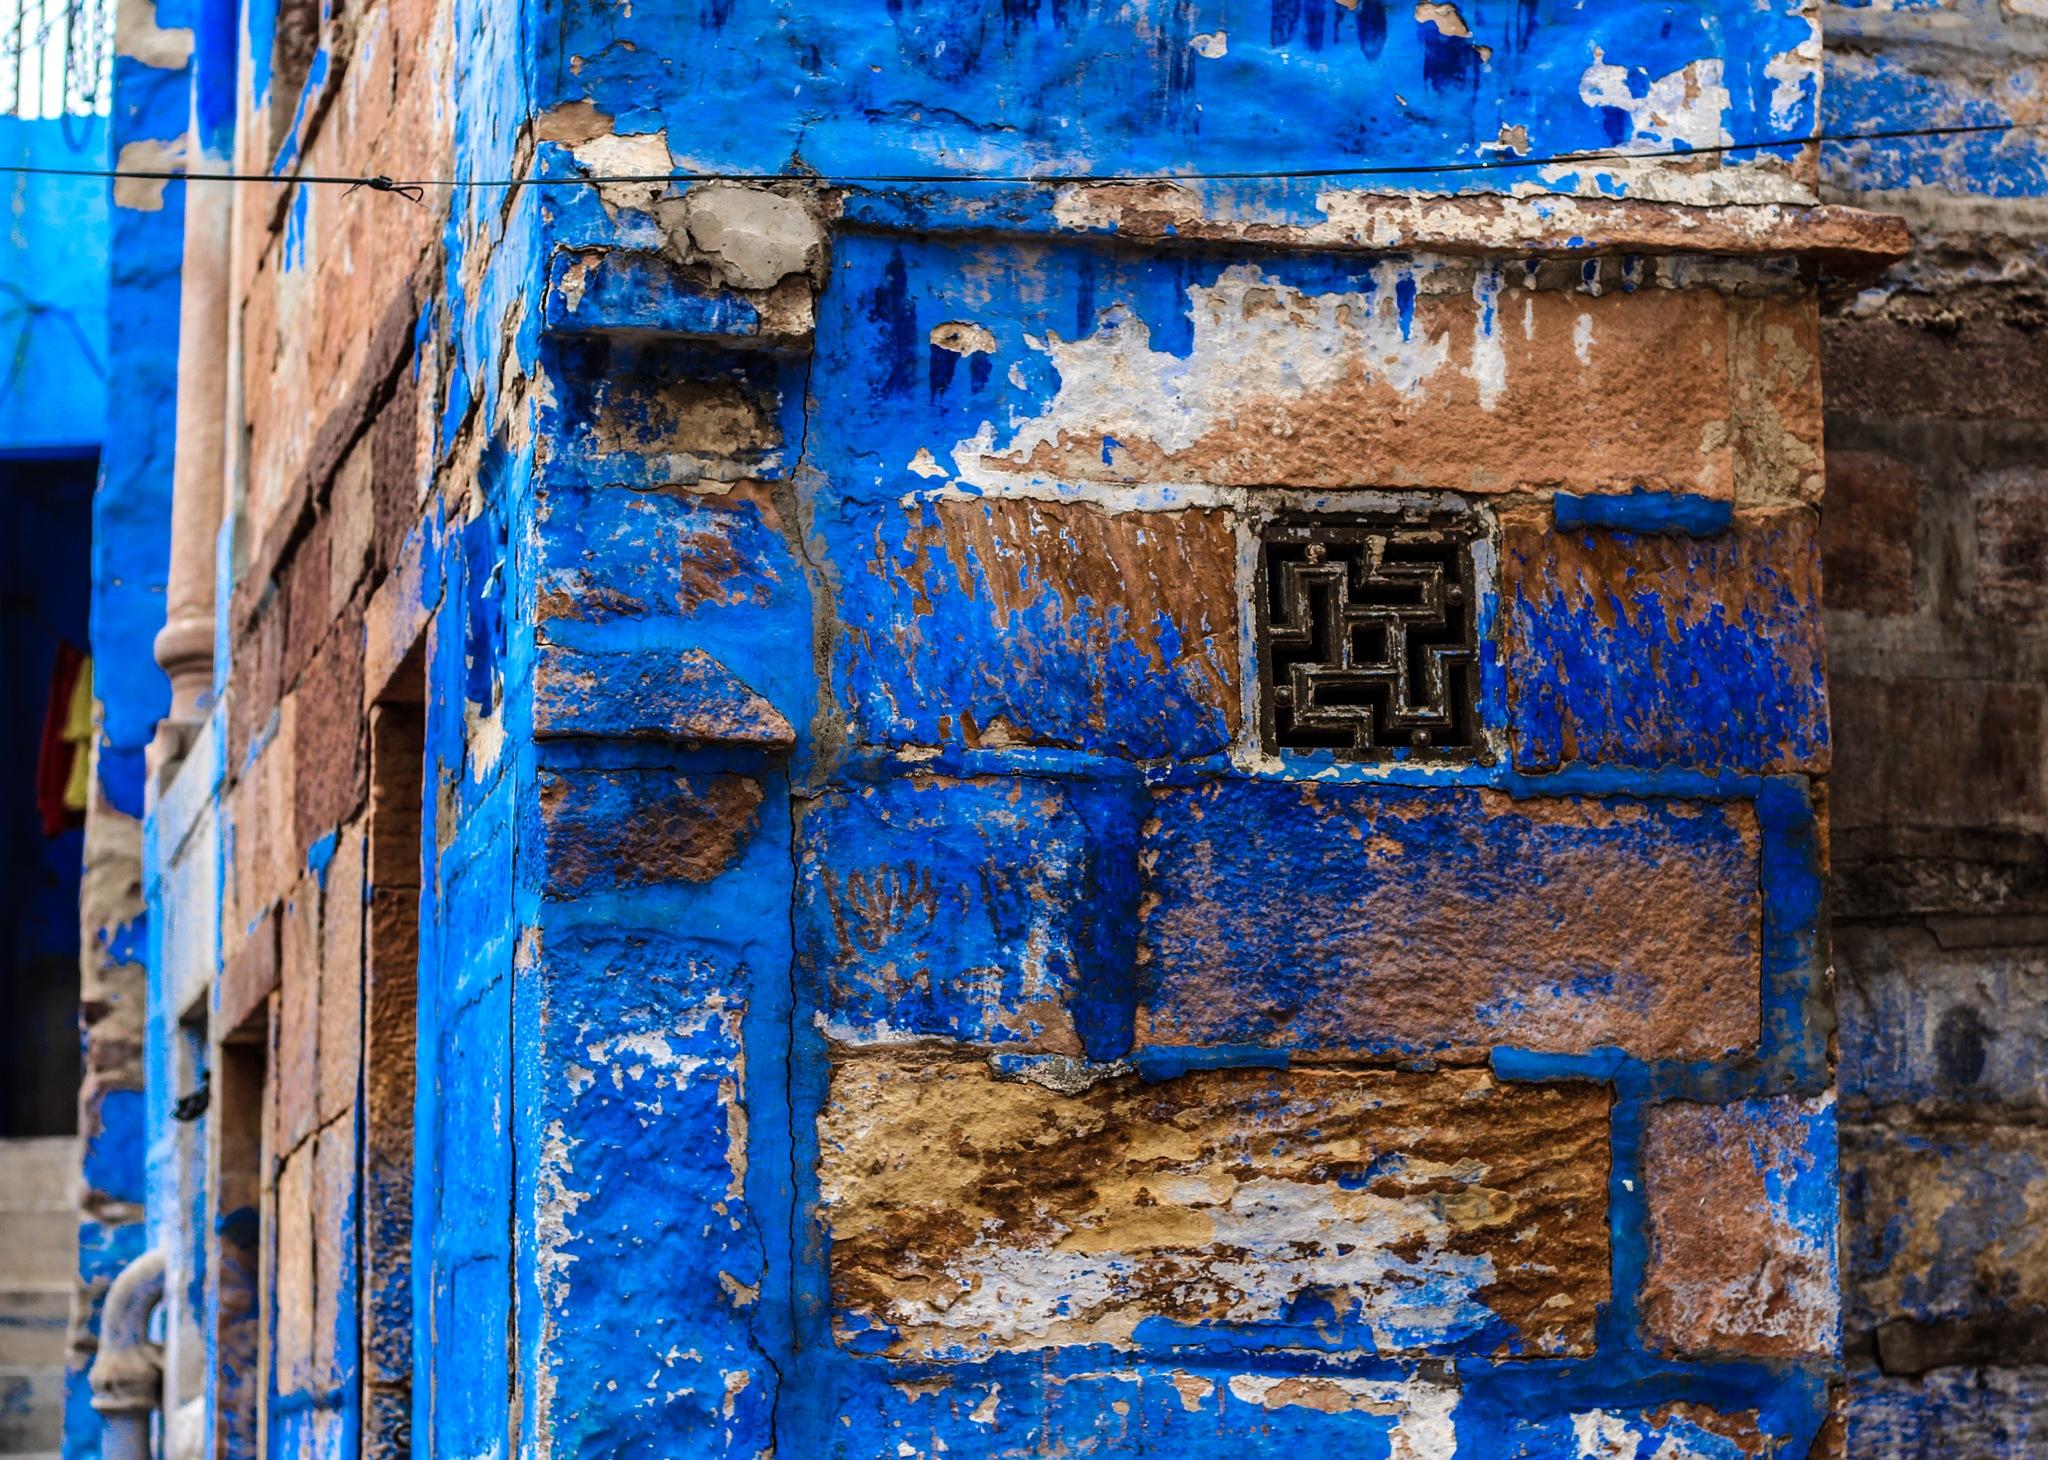 something from the blue city by Varsha Gupta